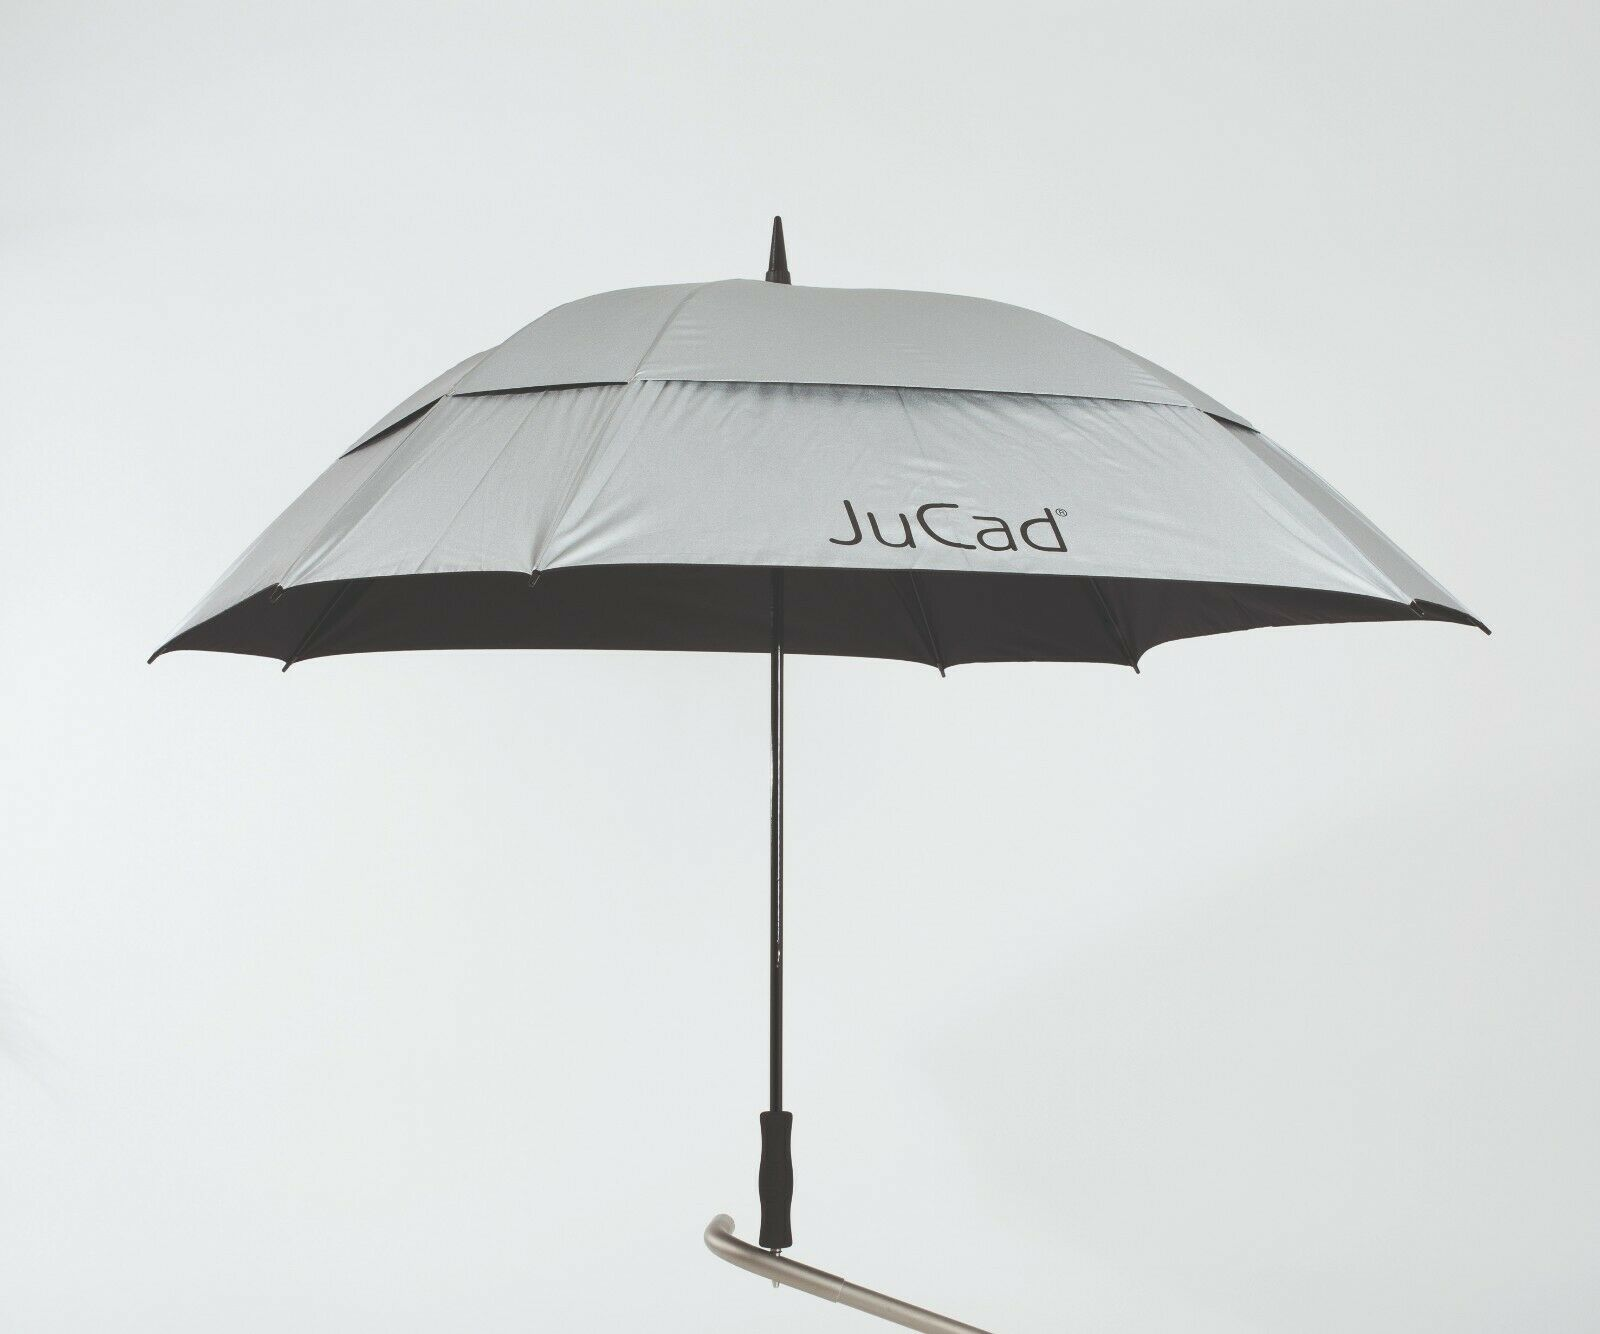 Jucad ® paraguas windproof  plata nuevo VK  95,-  salida